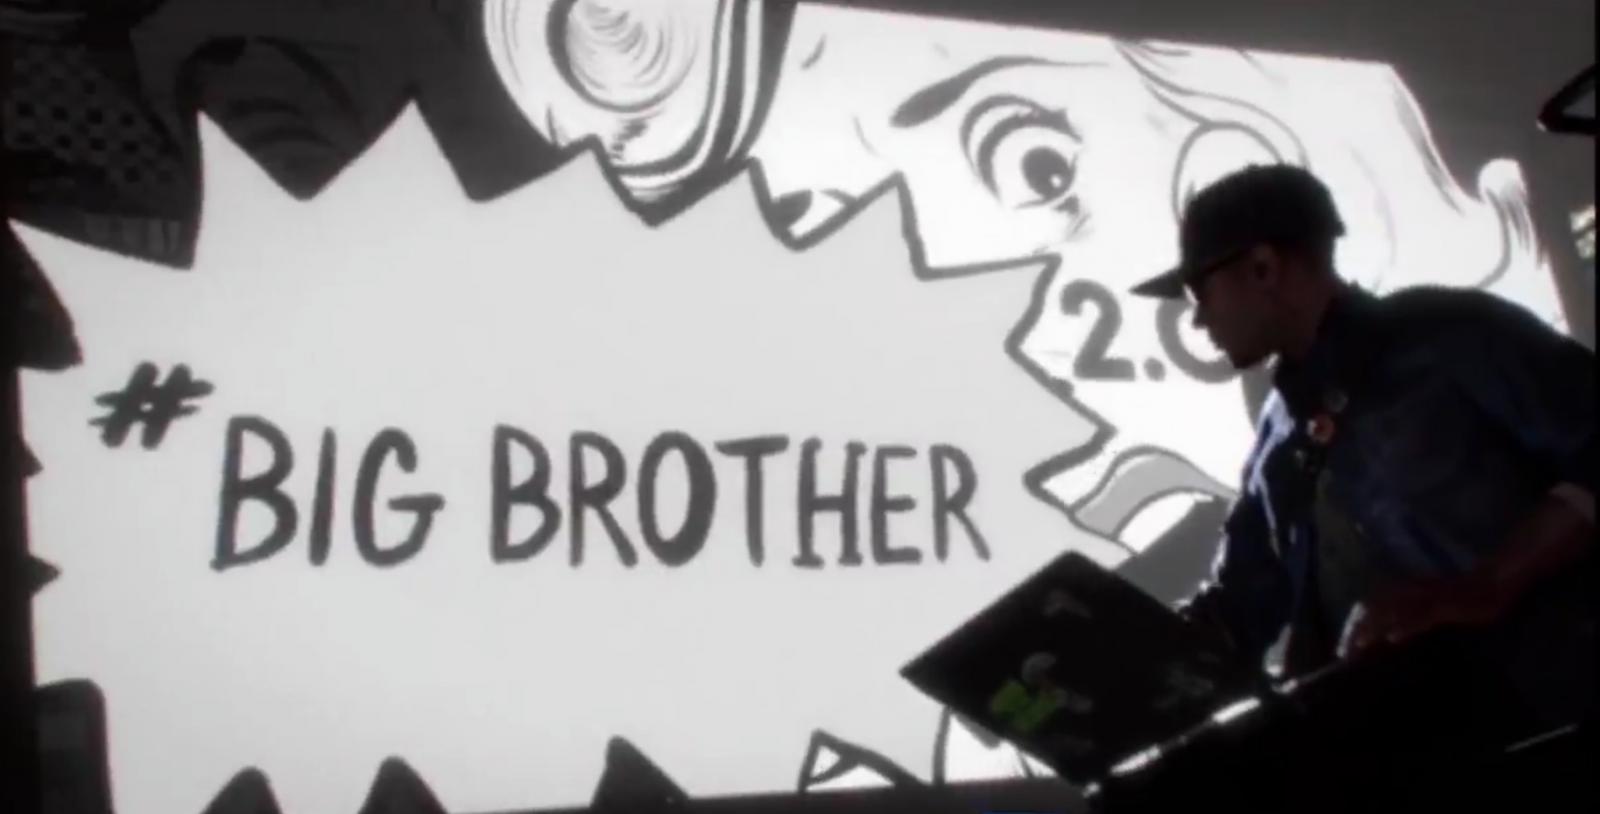 Watch Dogs 2 leaked trailer